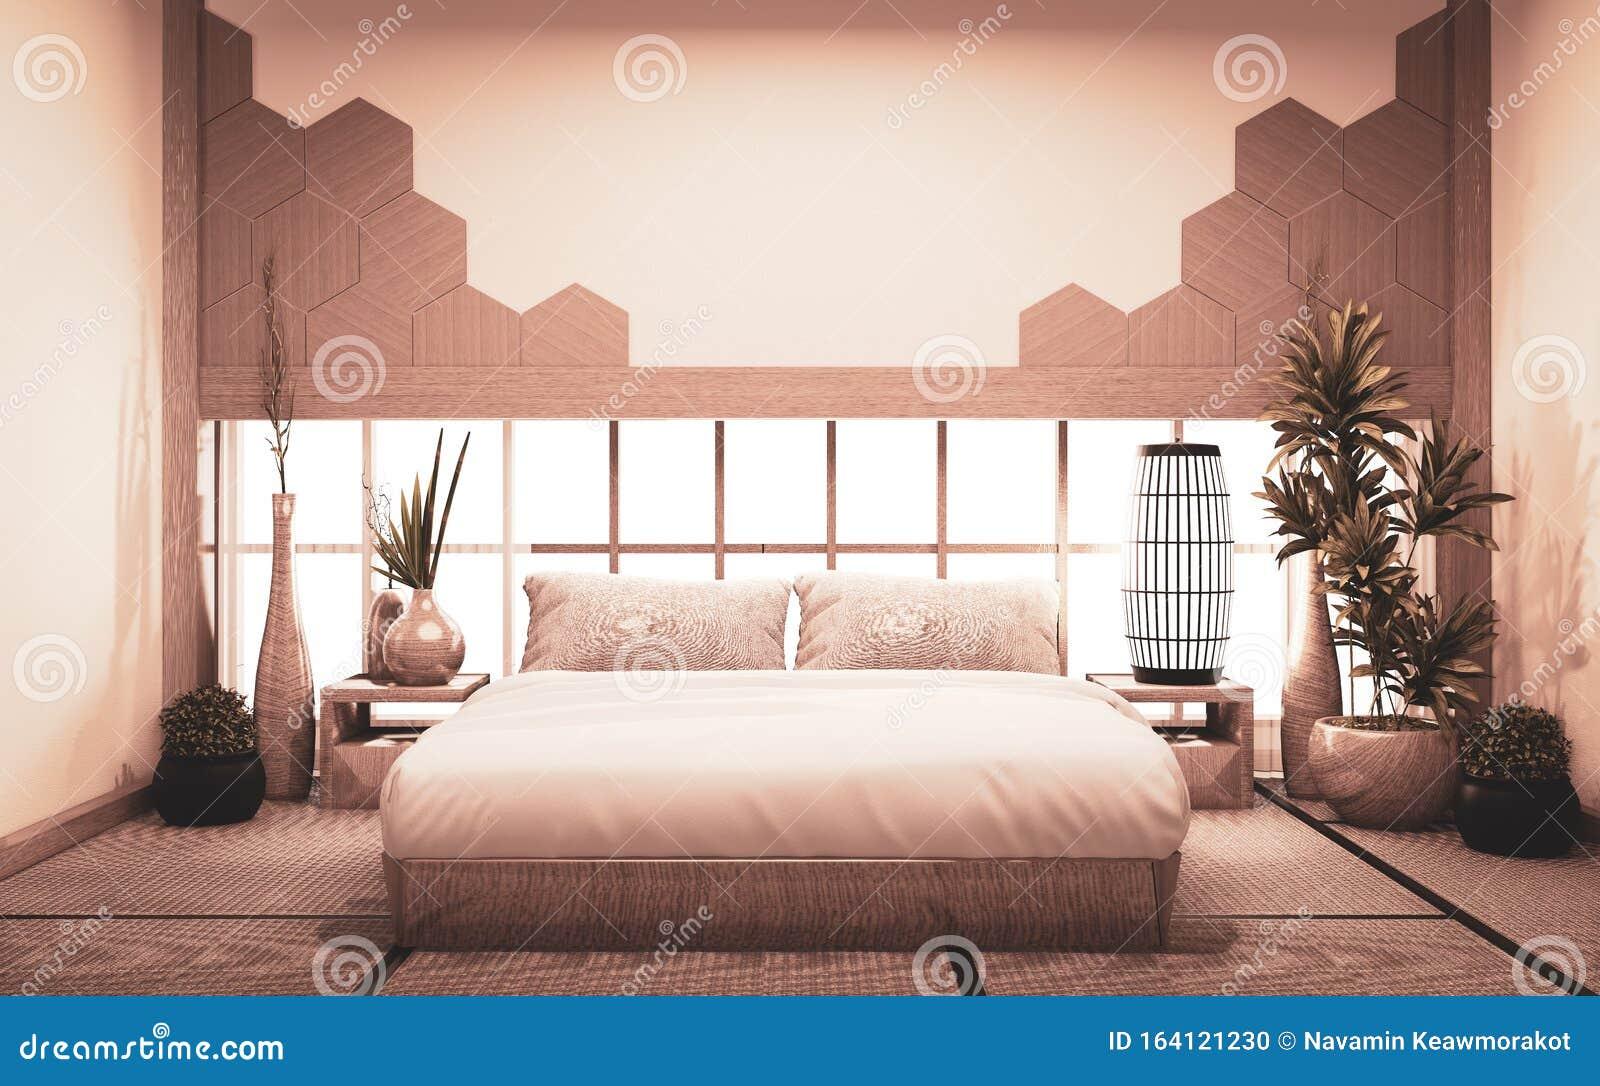 bedroom japan style wall design hexagon tiles wooden bed decoration tatami mat d rendering 164121230